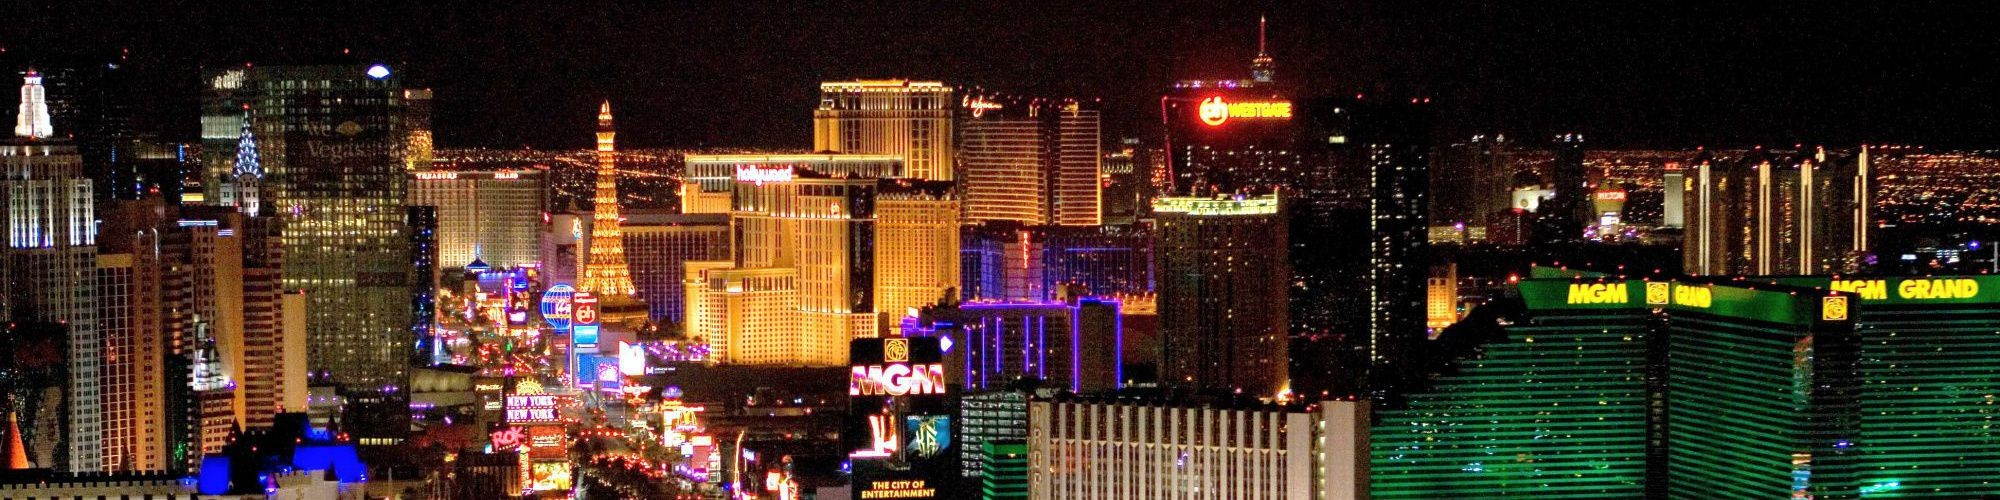 WASTE EXPO - Las_Vegas_89 Cropped